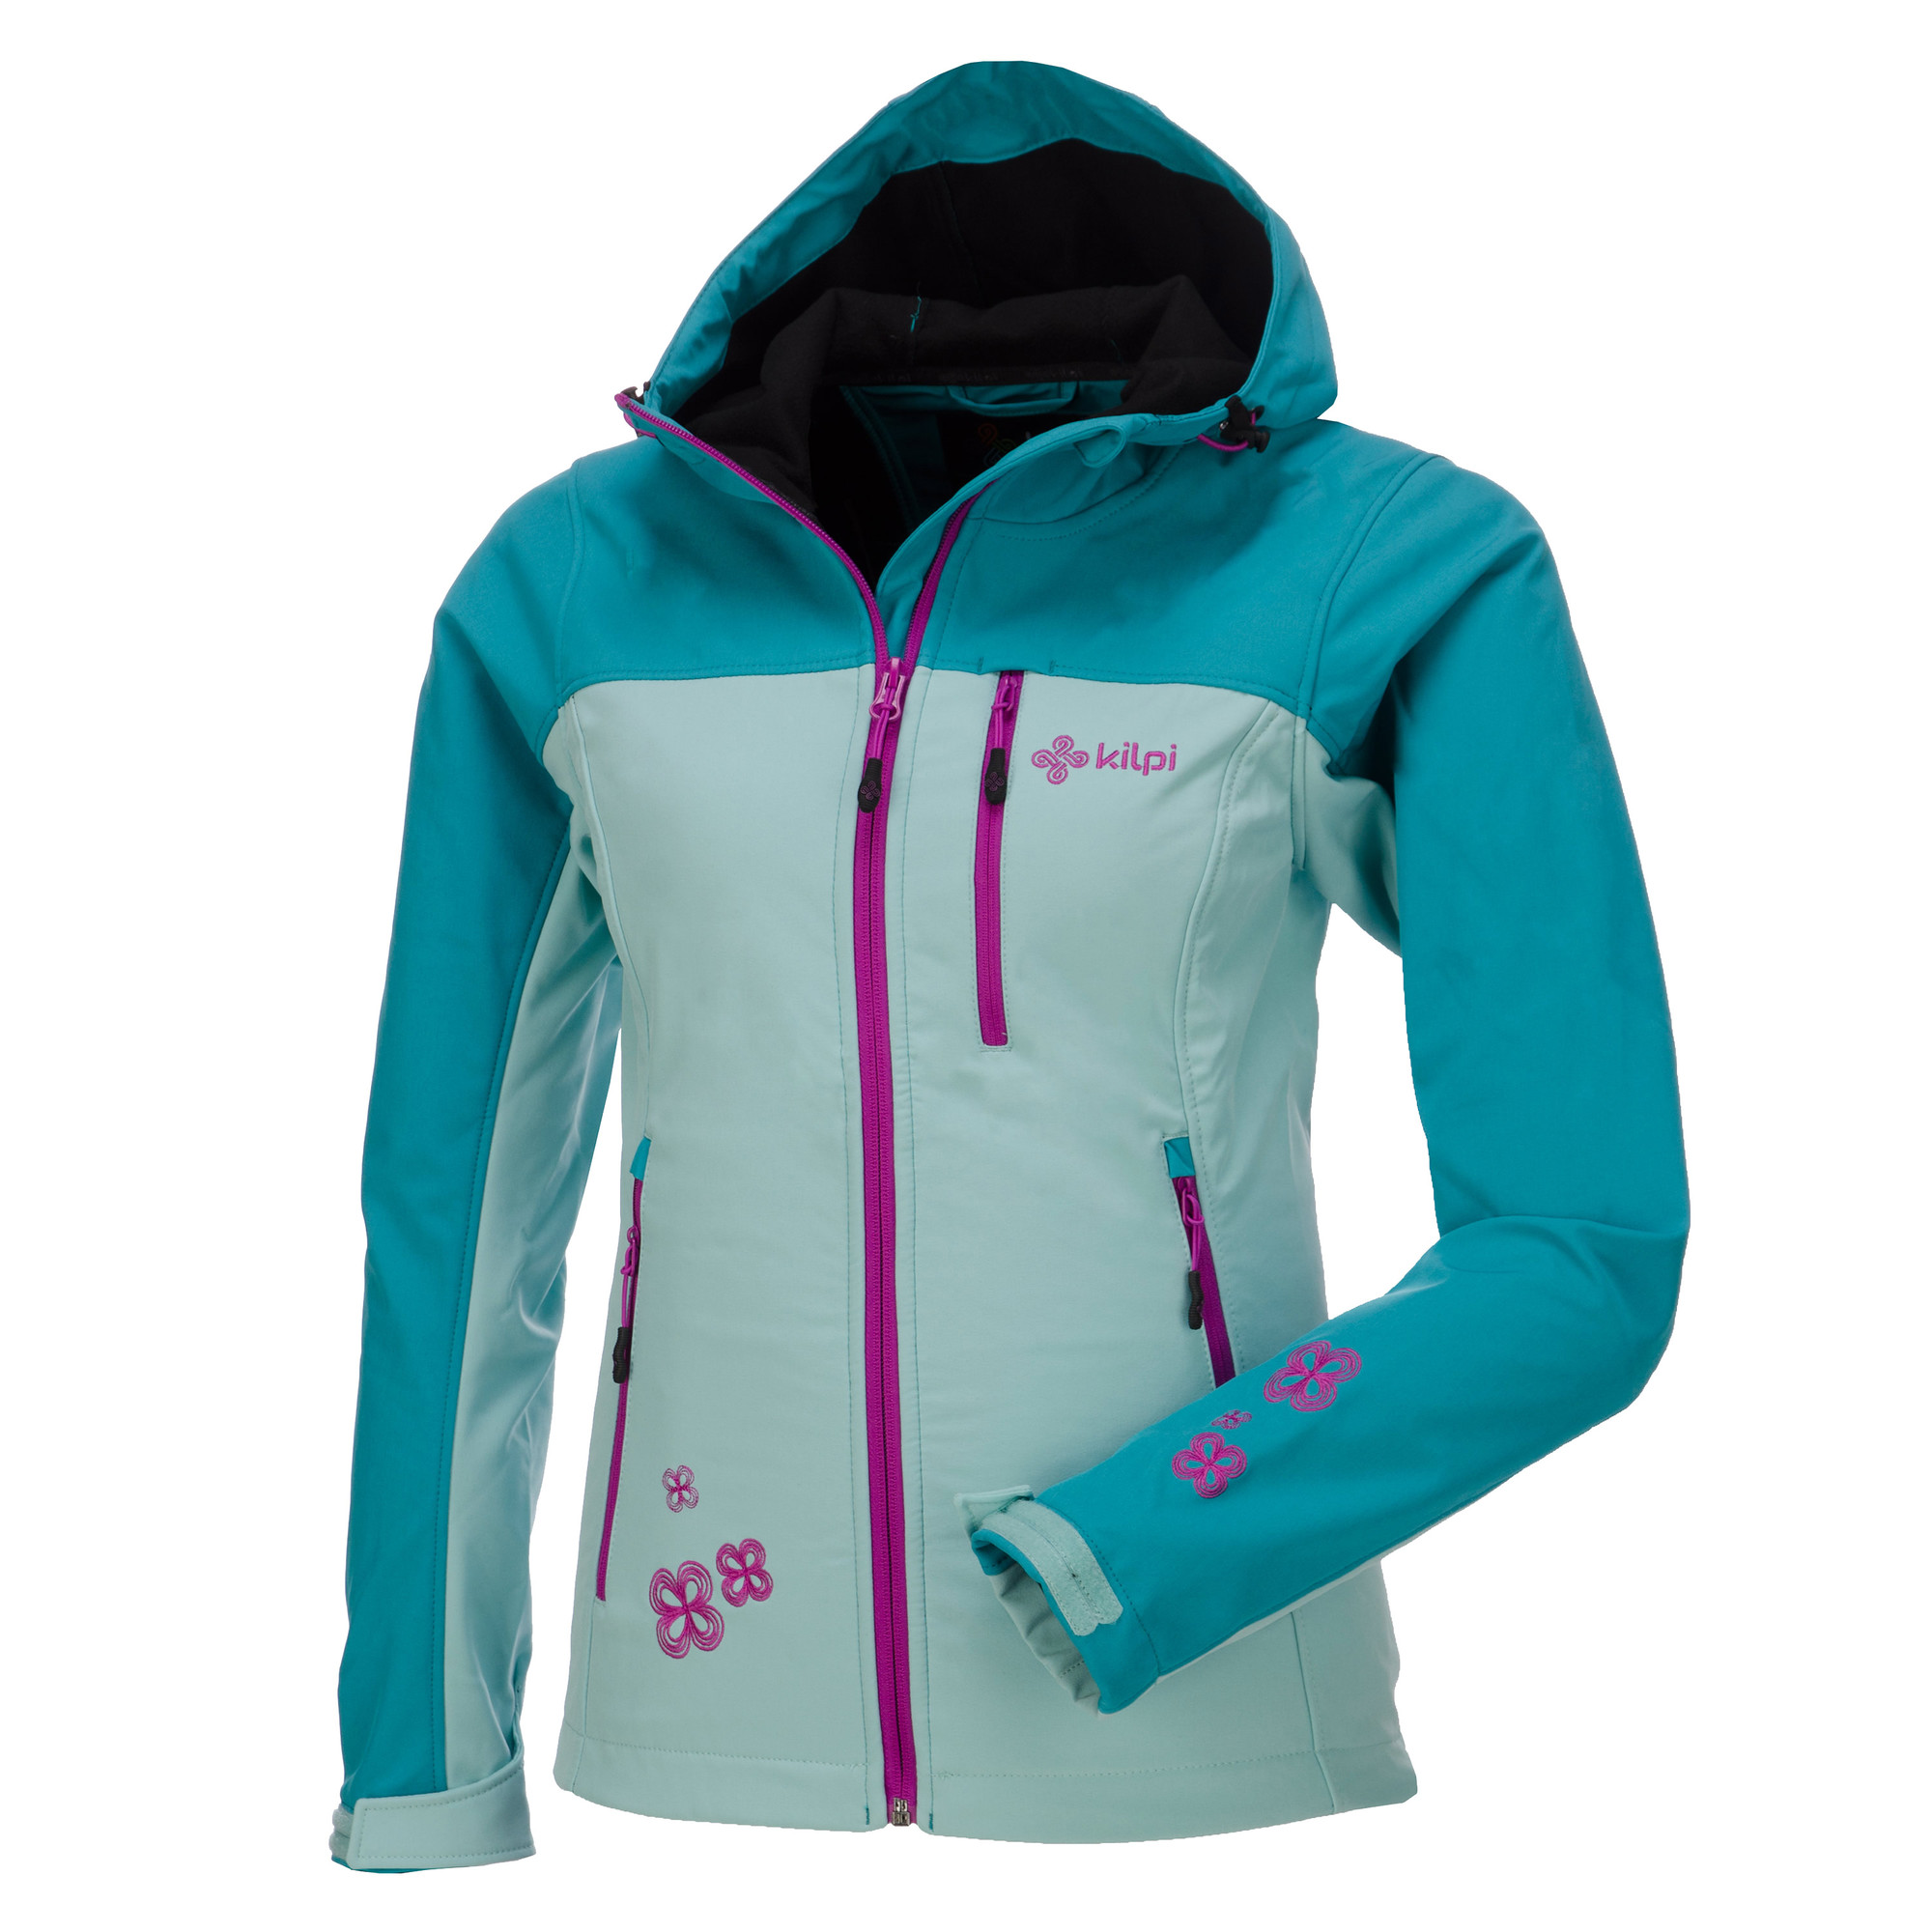 f7ed2cd82c91db kilpi elia ski-jas dames blauw lichtblauw sc25kils47h 1-2 sp.jpg